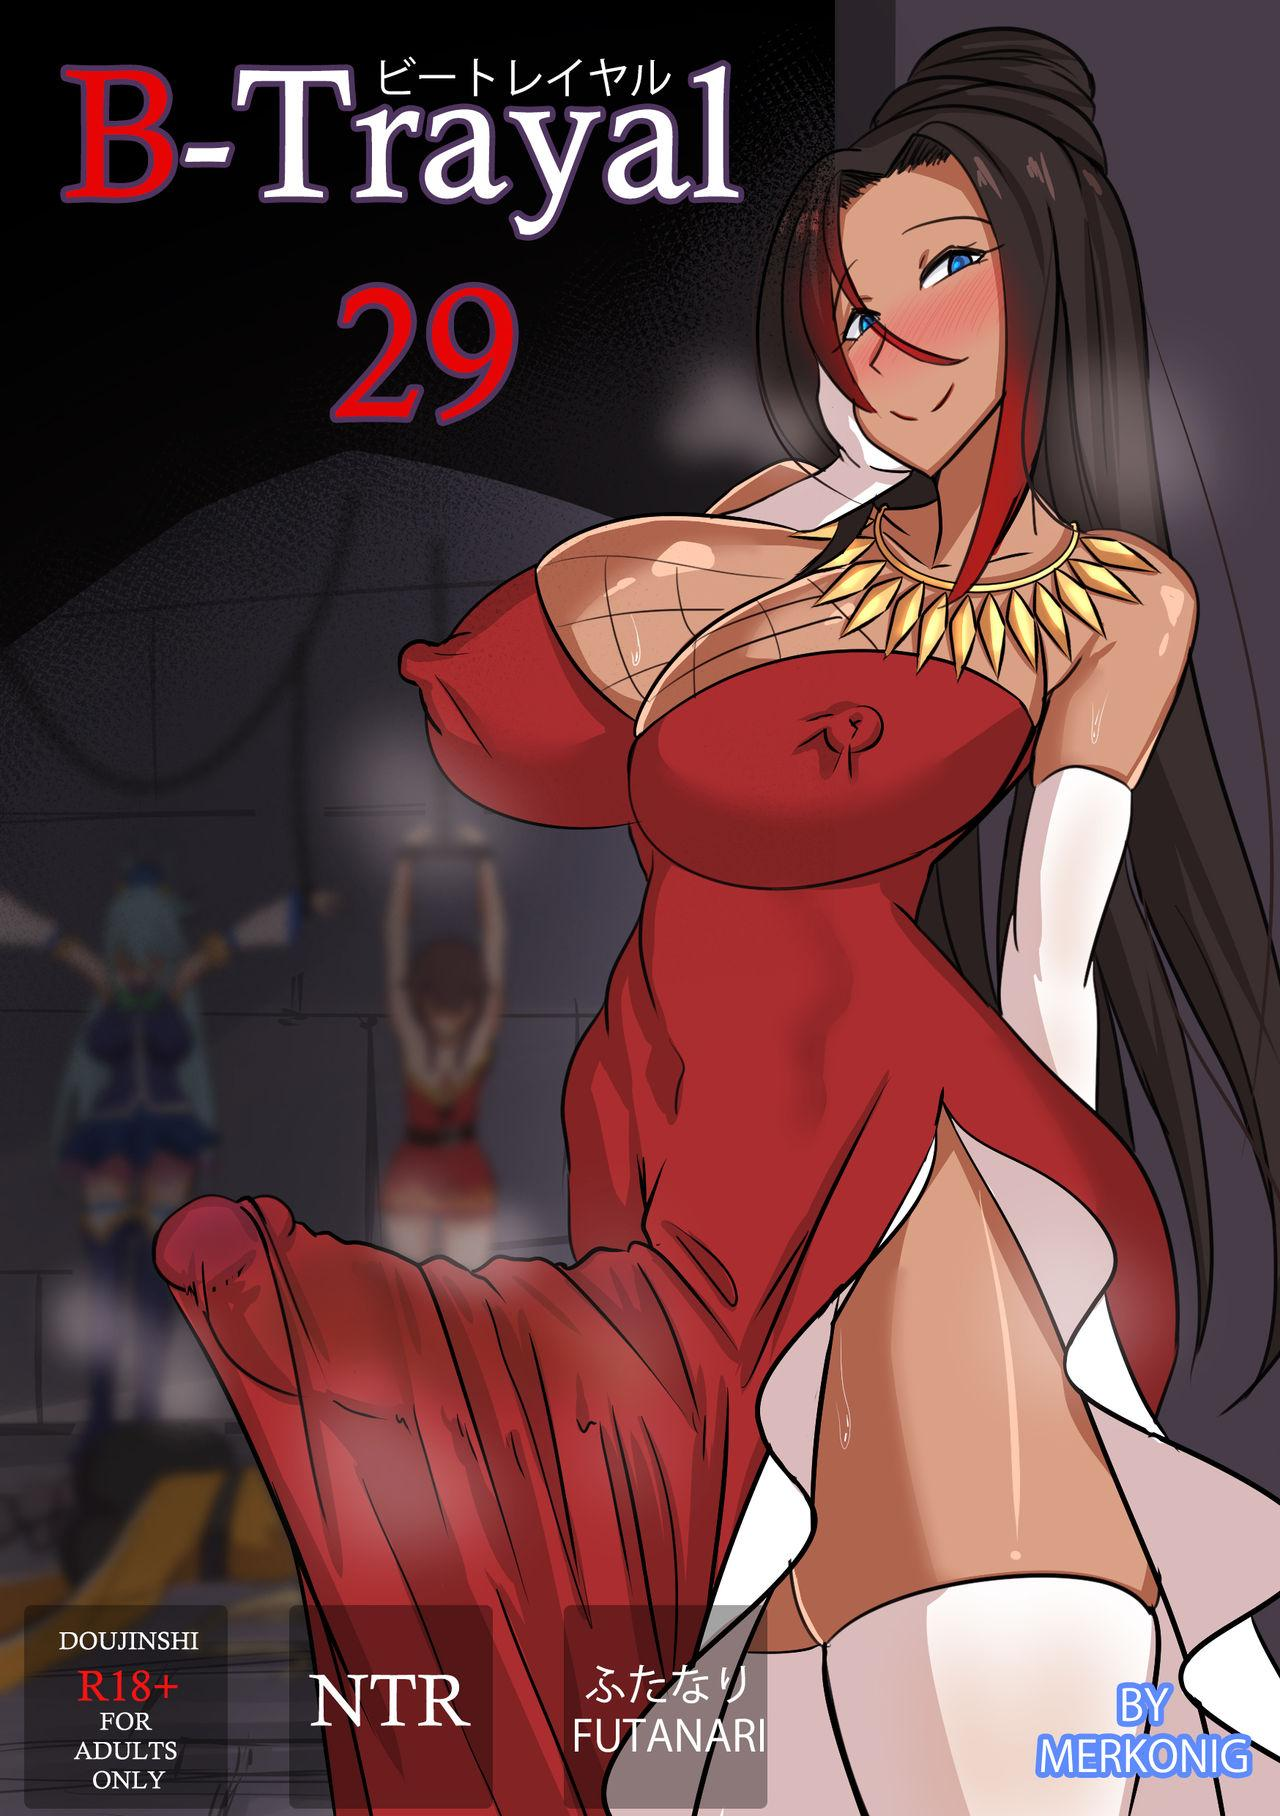 B-Trayal 29 Sylvia(kunosuba) Censored (EN) 0